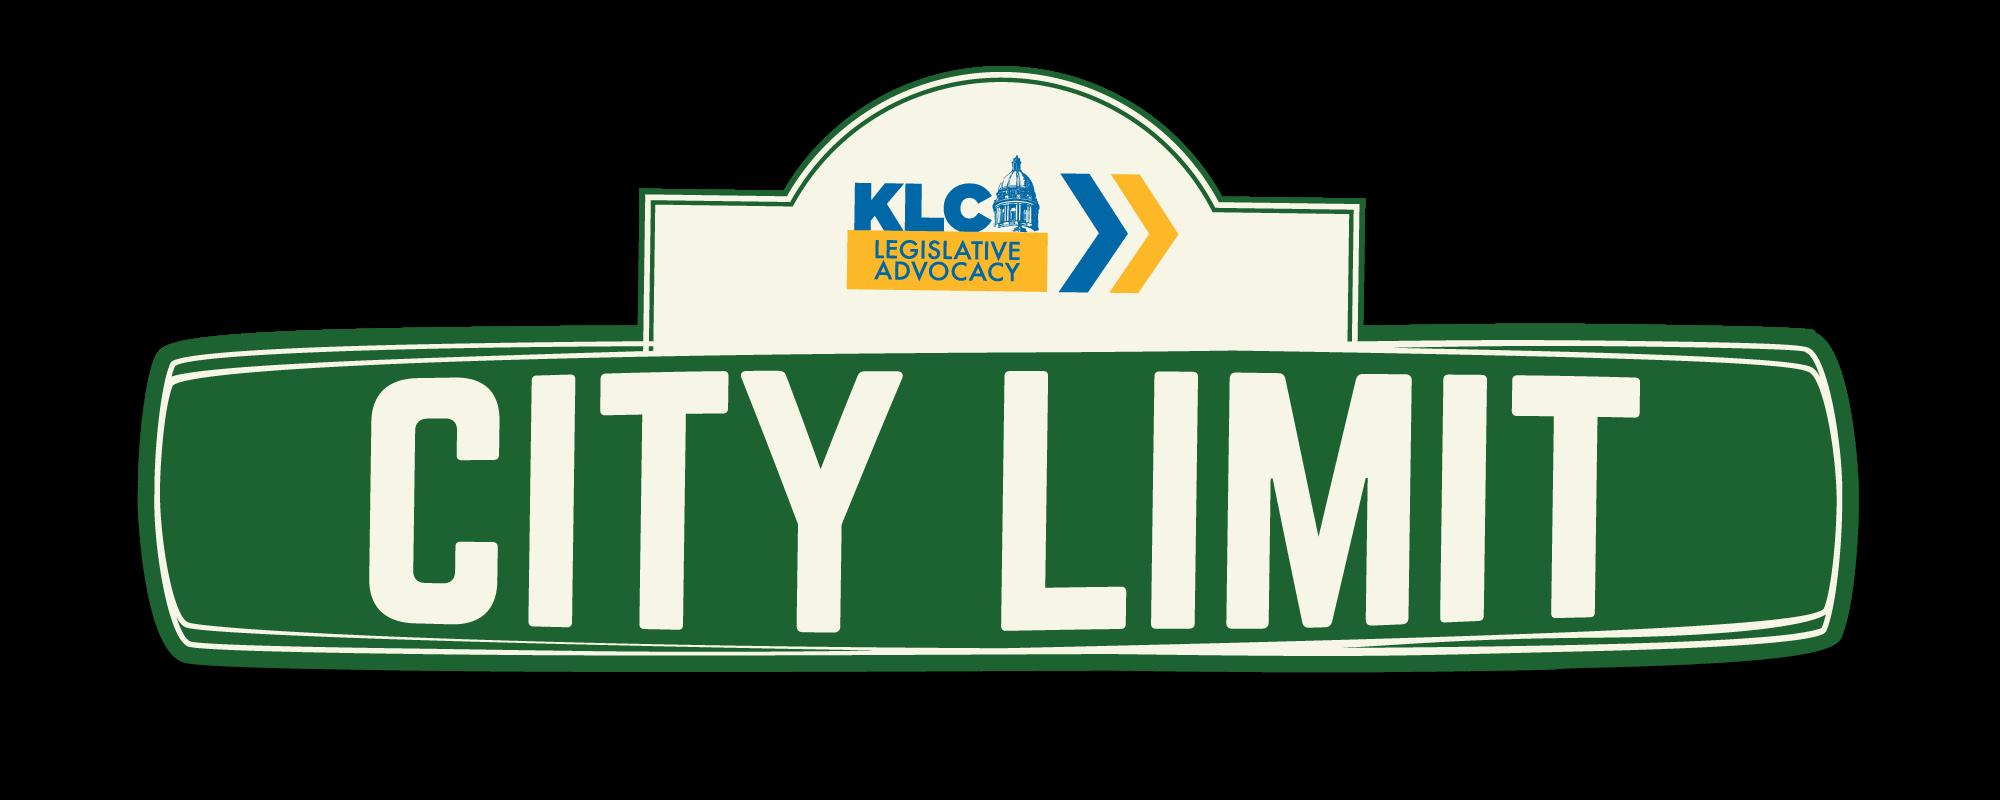 KLC City Limit